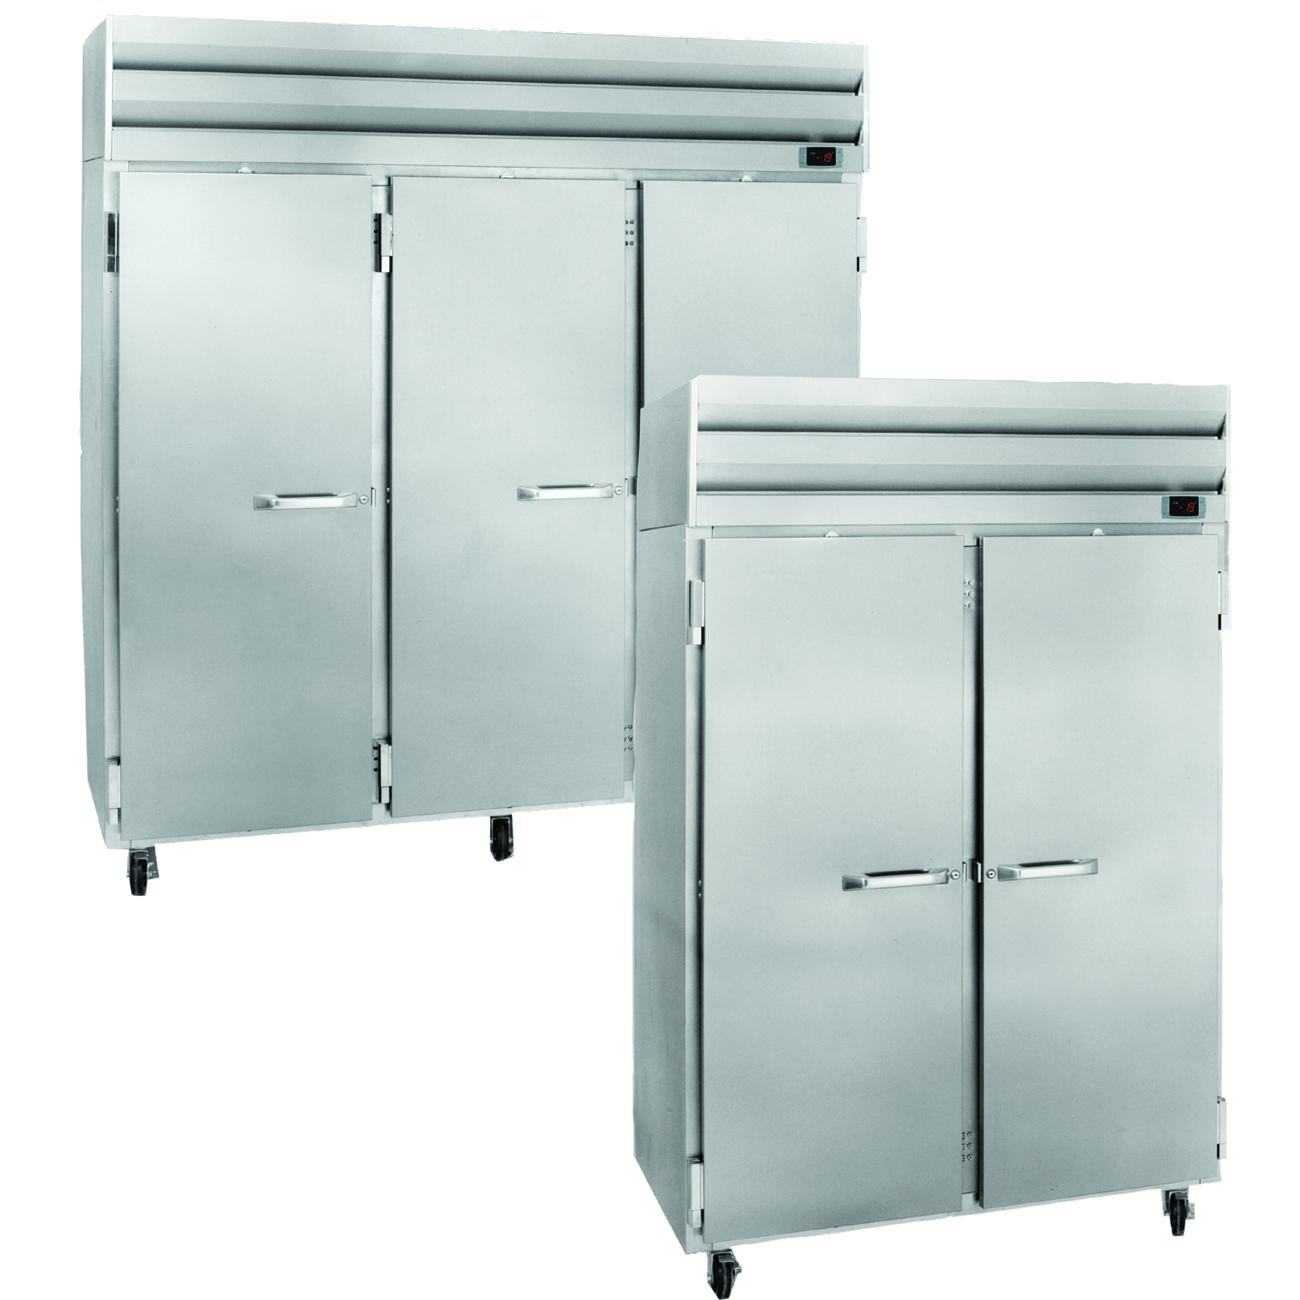 Howard-McCray R-SF75-FF freezer, reach-in